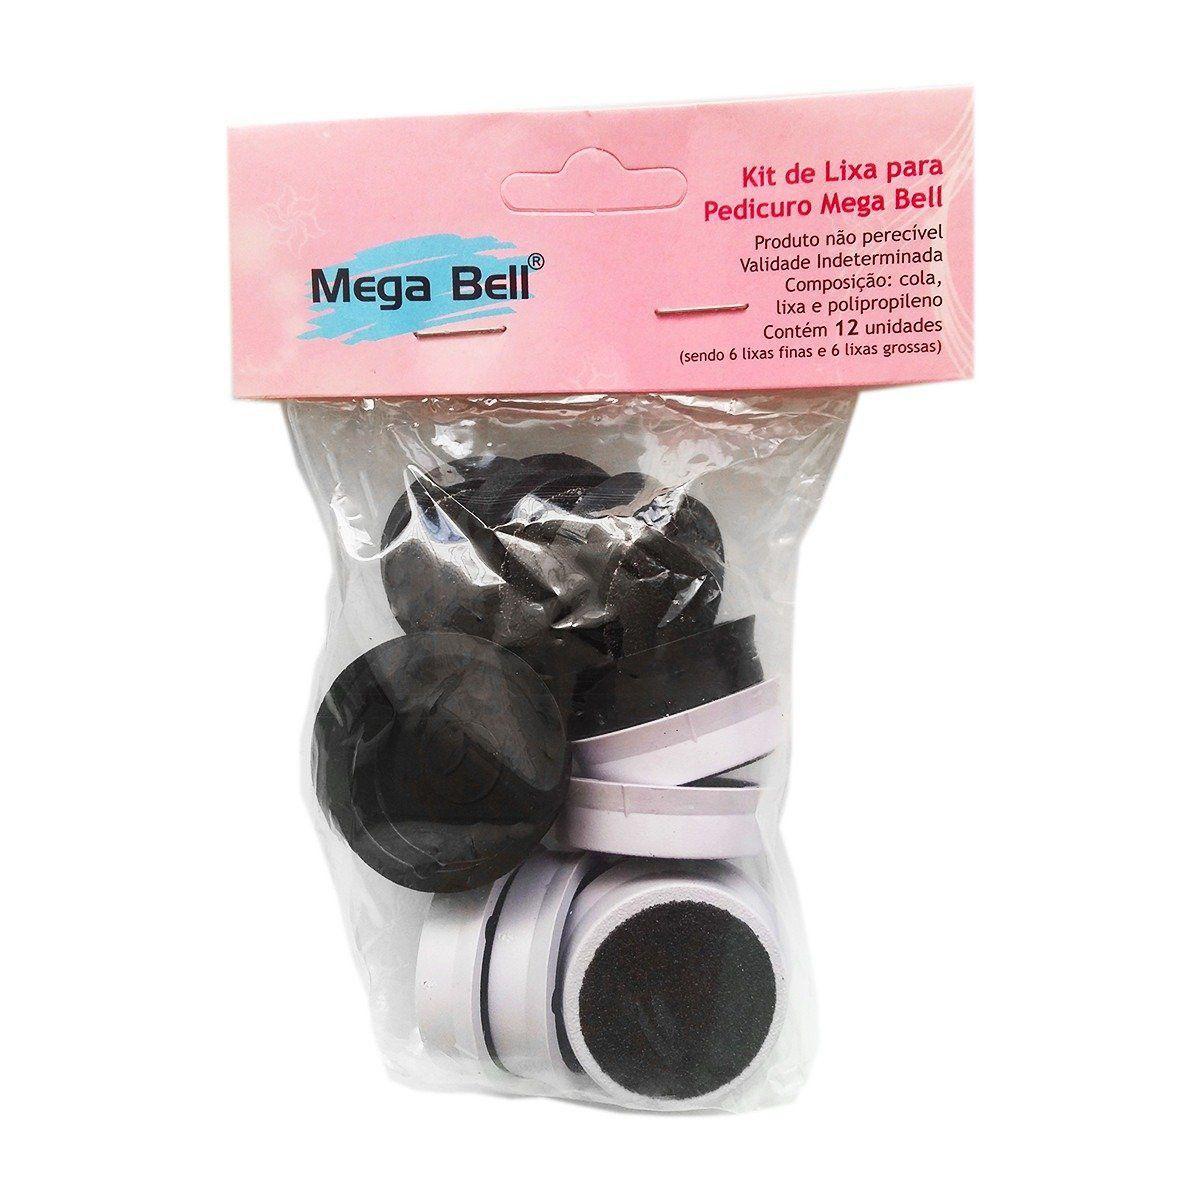 Pedicuro Elétrico Esfoliador Lixa Elétrica para os Pés Prata + 48 Lixas Descartáveis (Escolha a Voltagem)